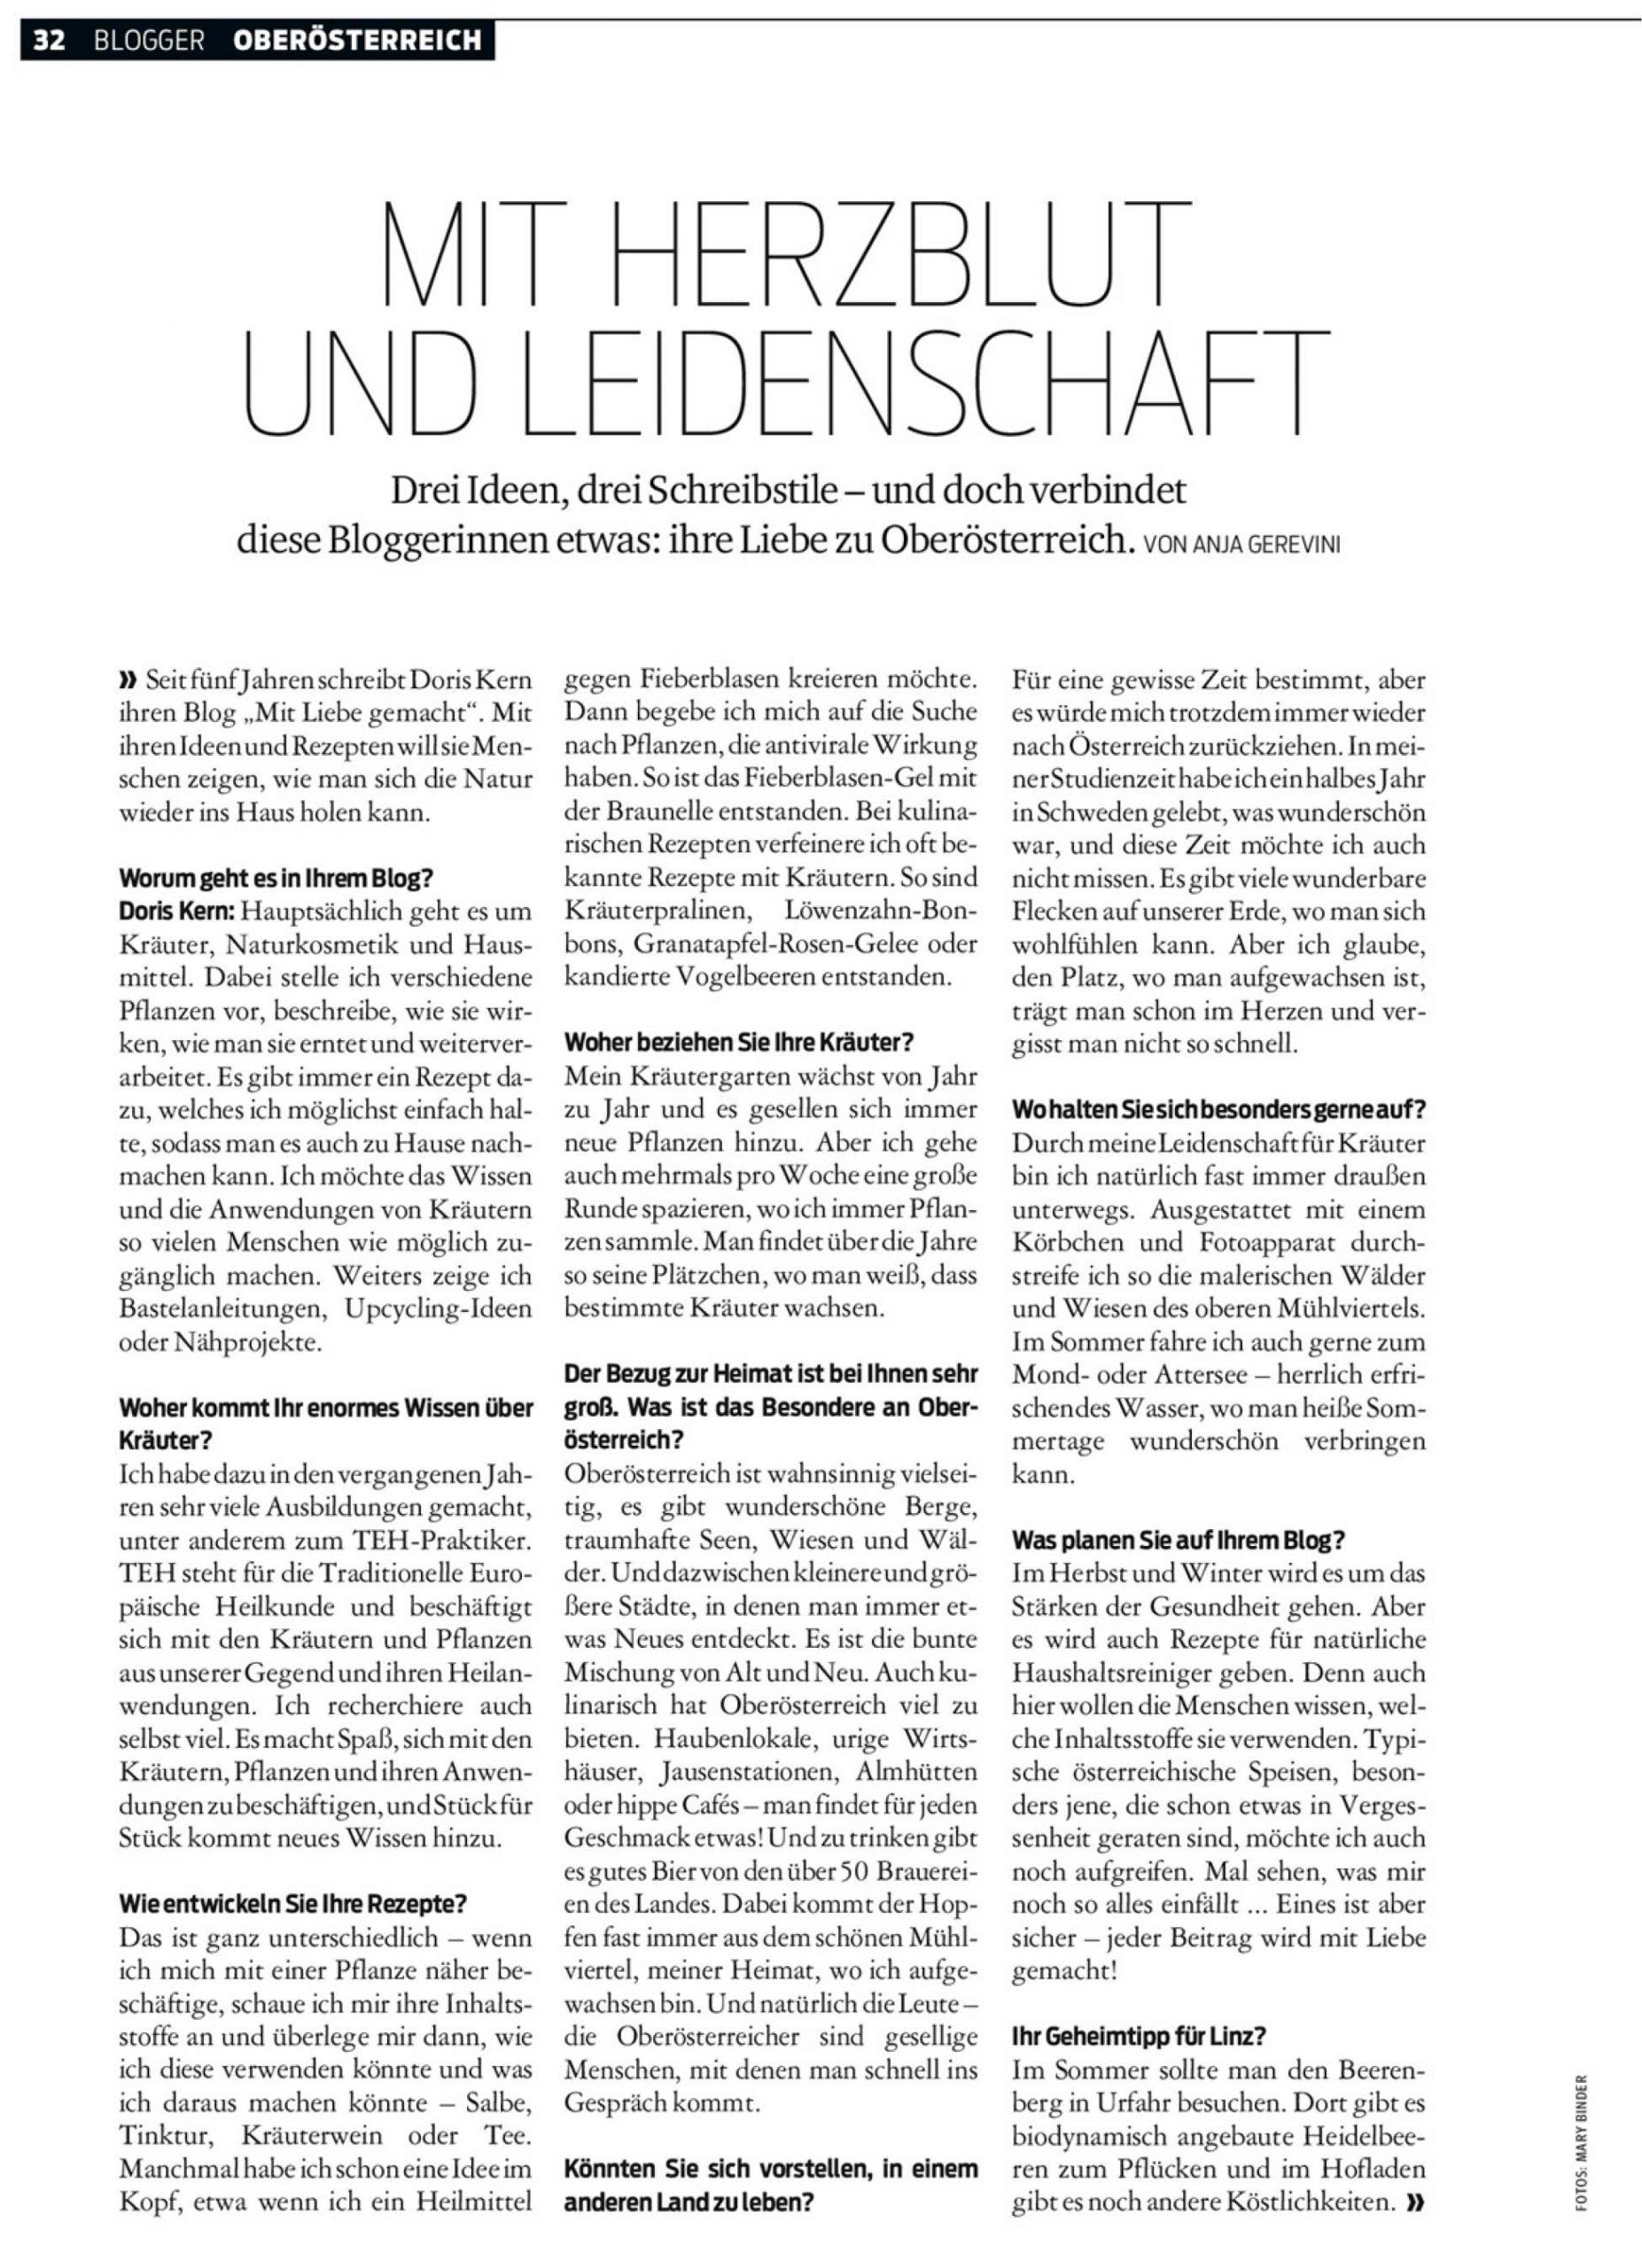 Kurier_Magazin_10_2019_Seite1